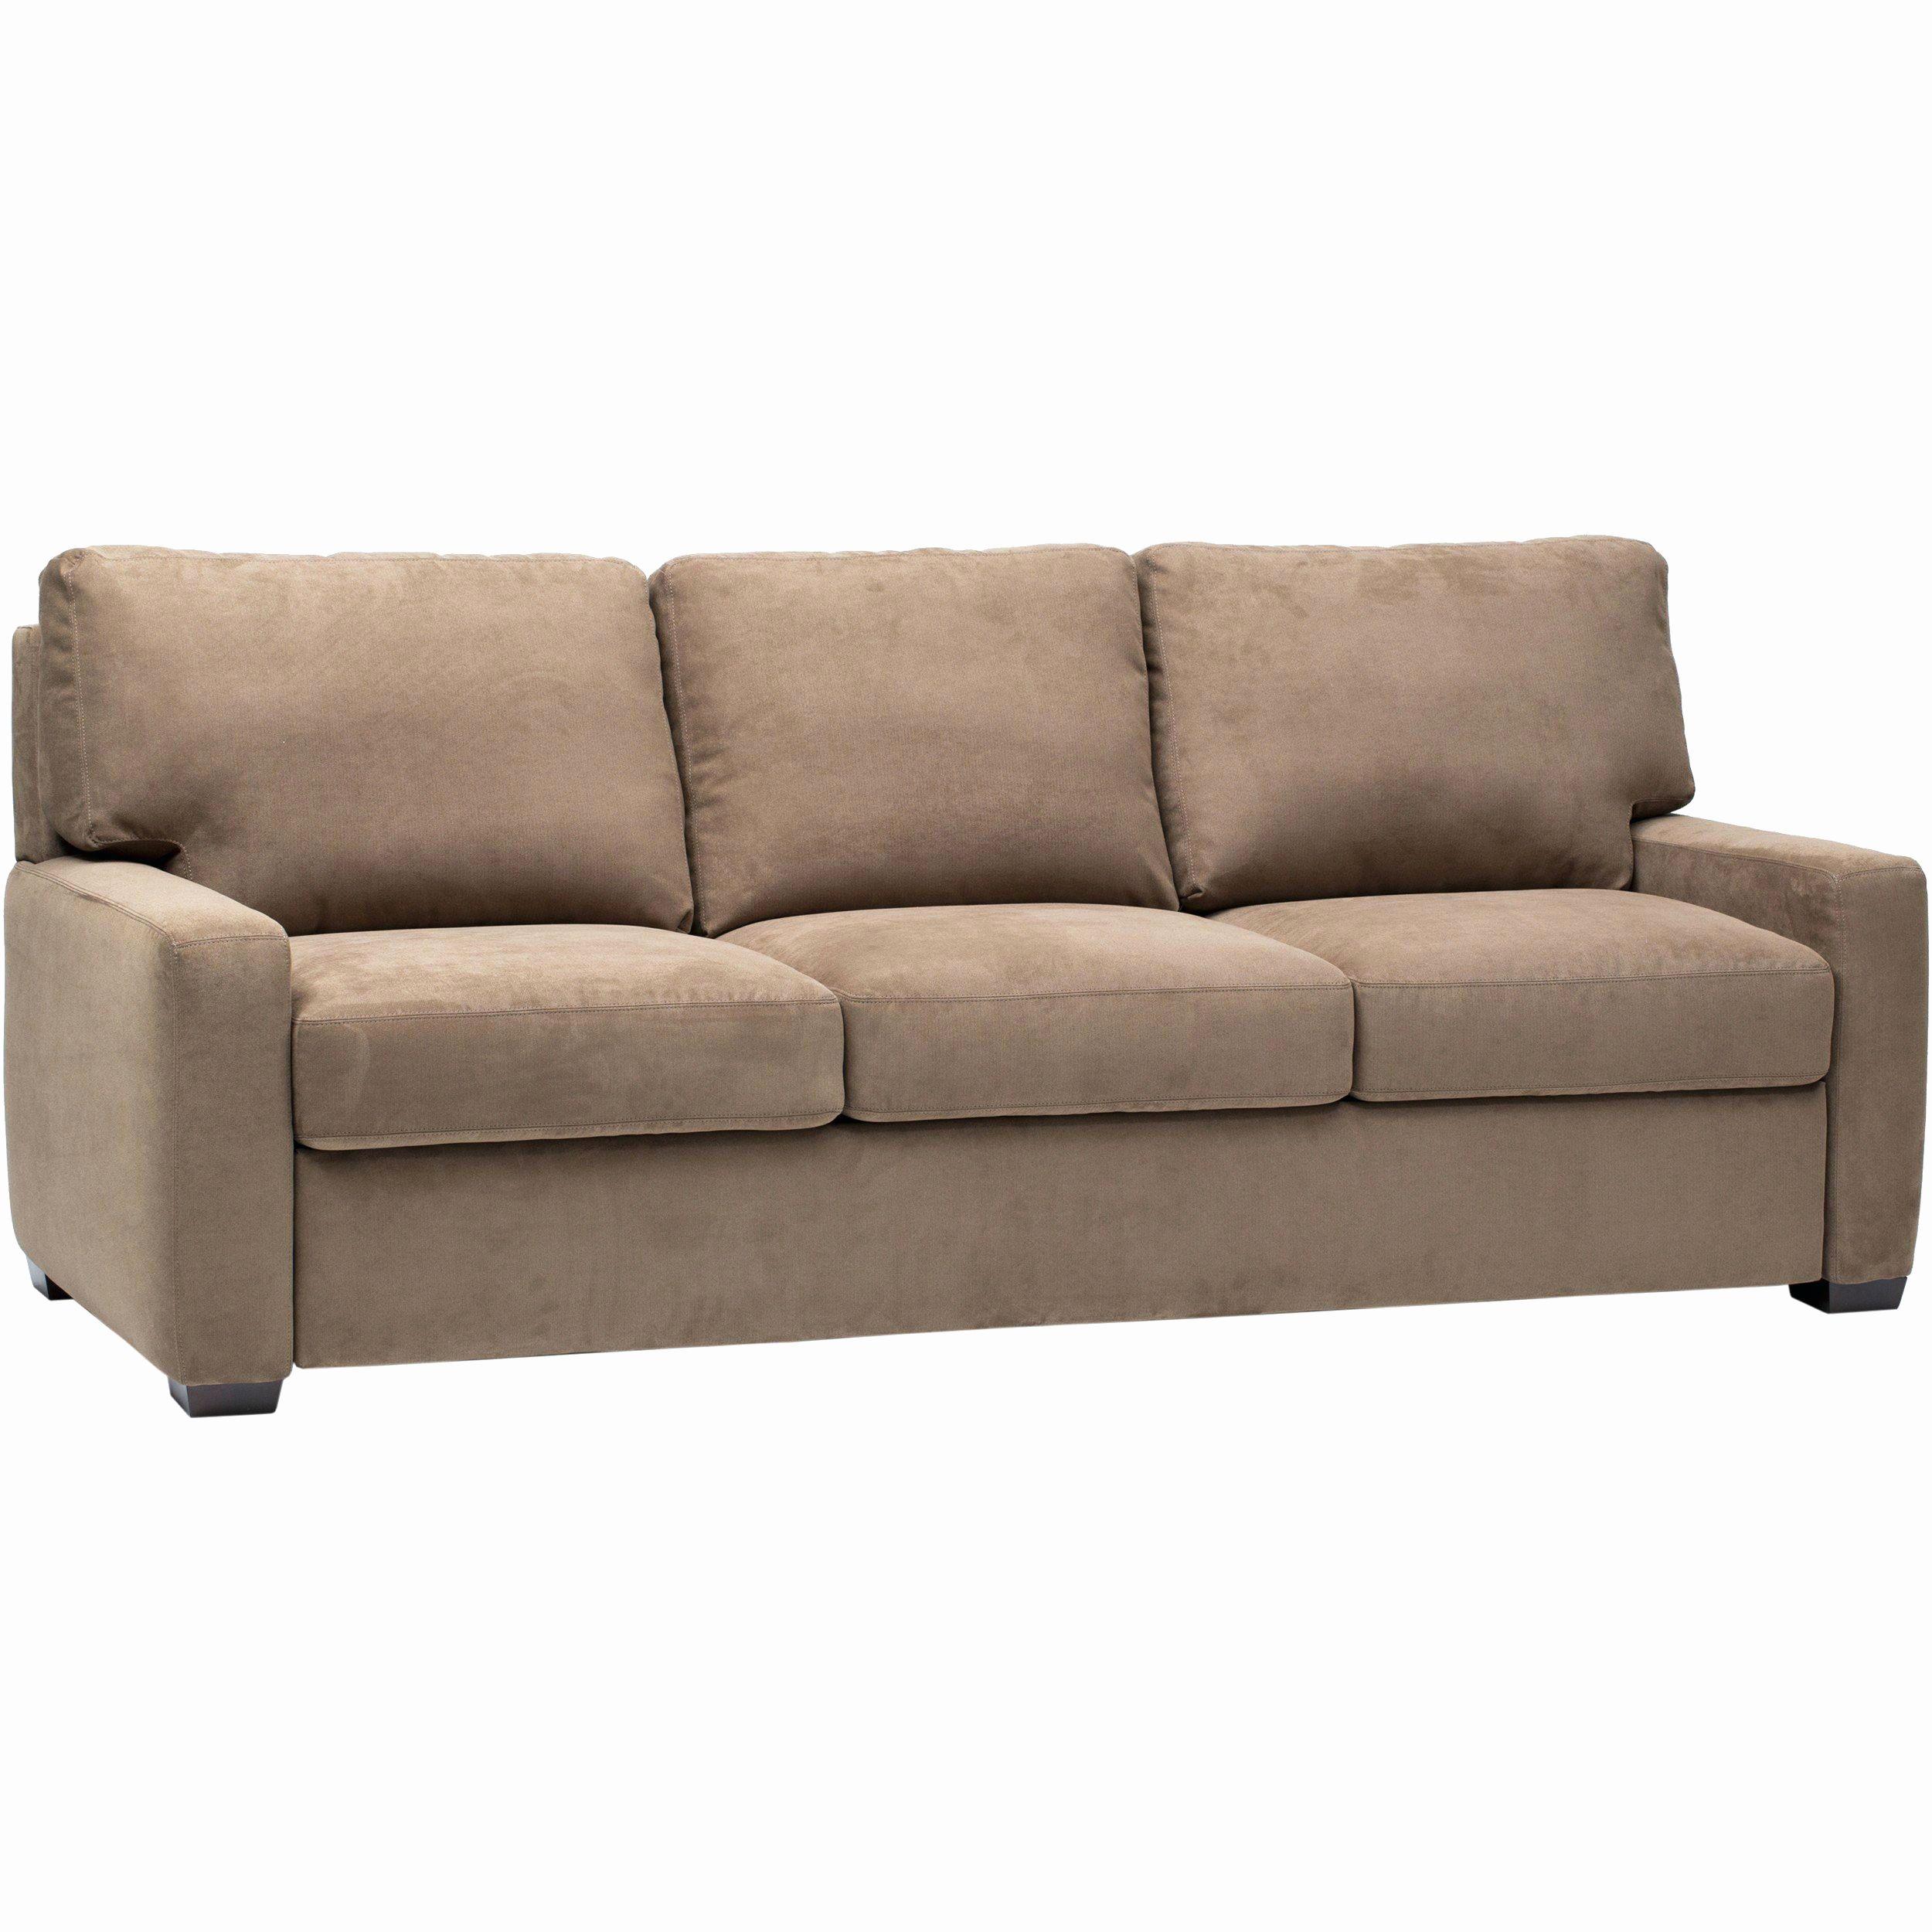 Unique American Leather Sleeper sofa Reviews Art American